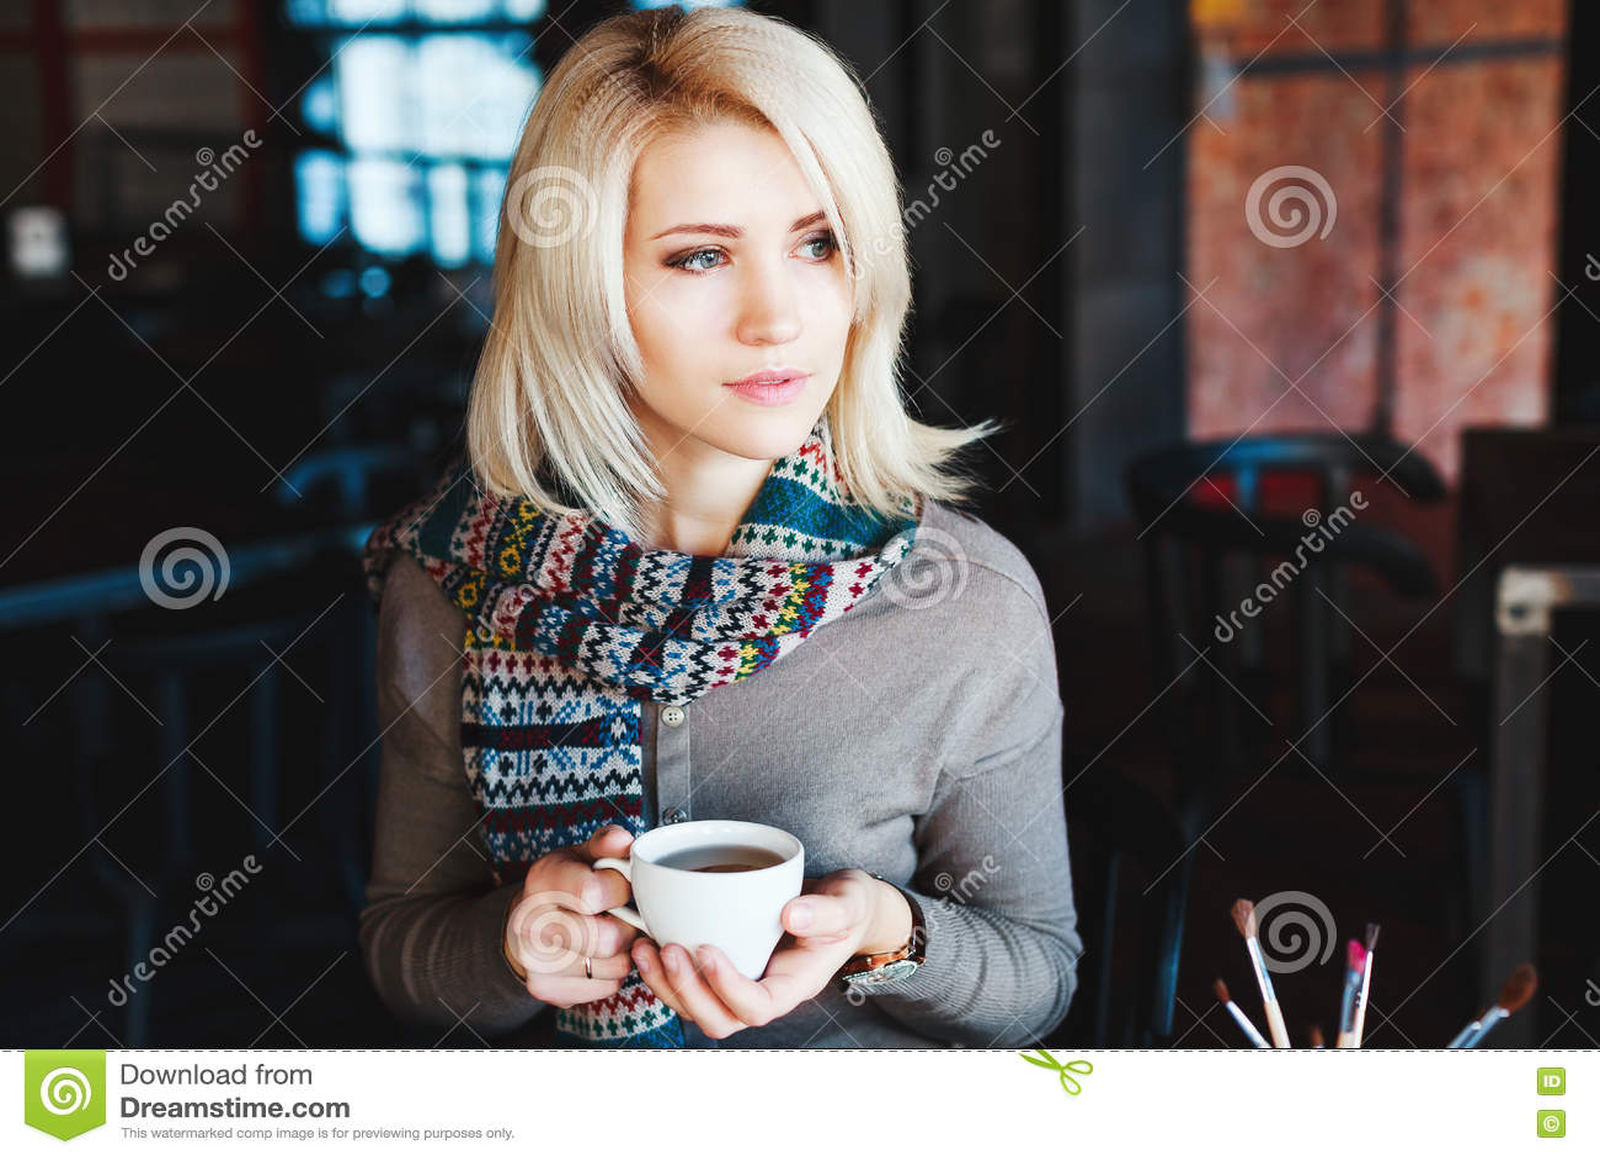 blonde c cup nude